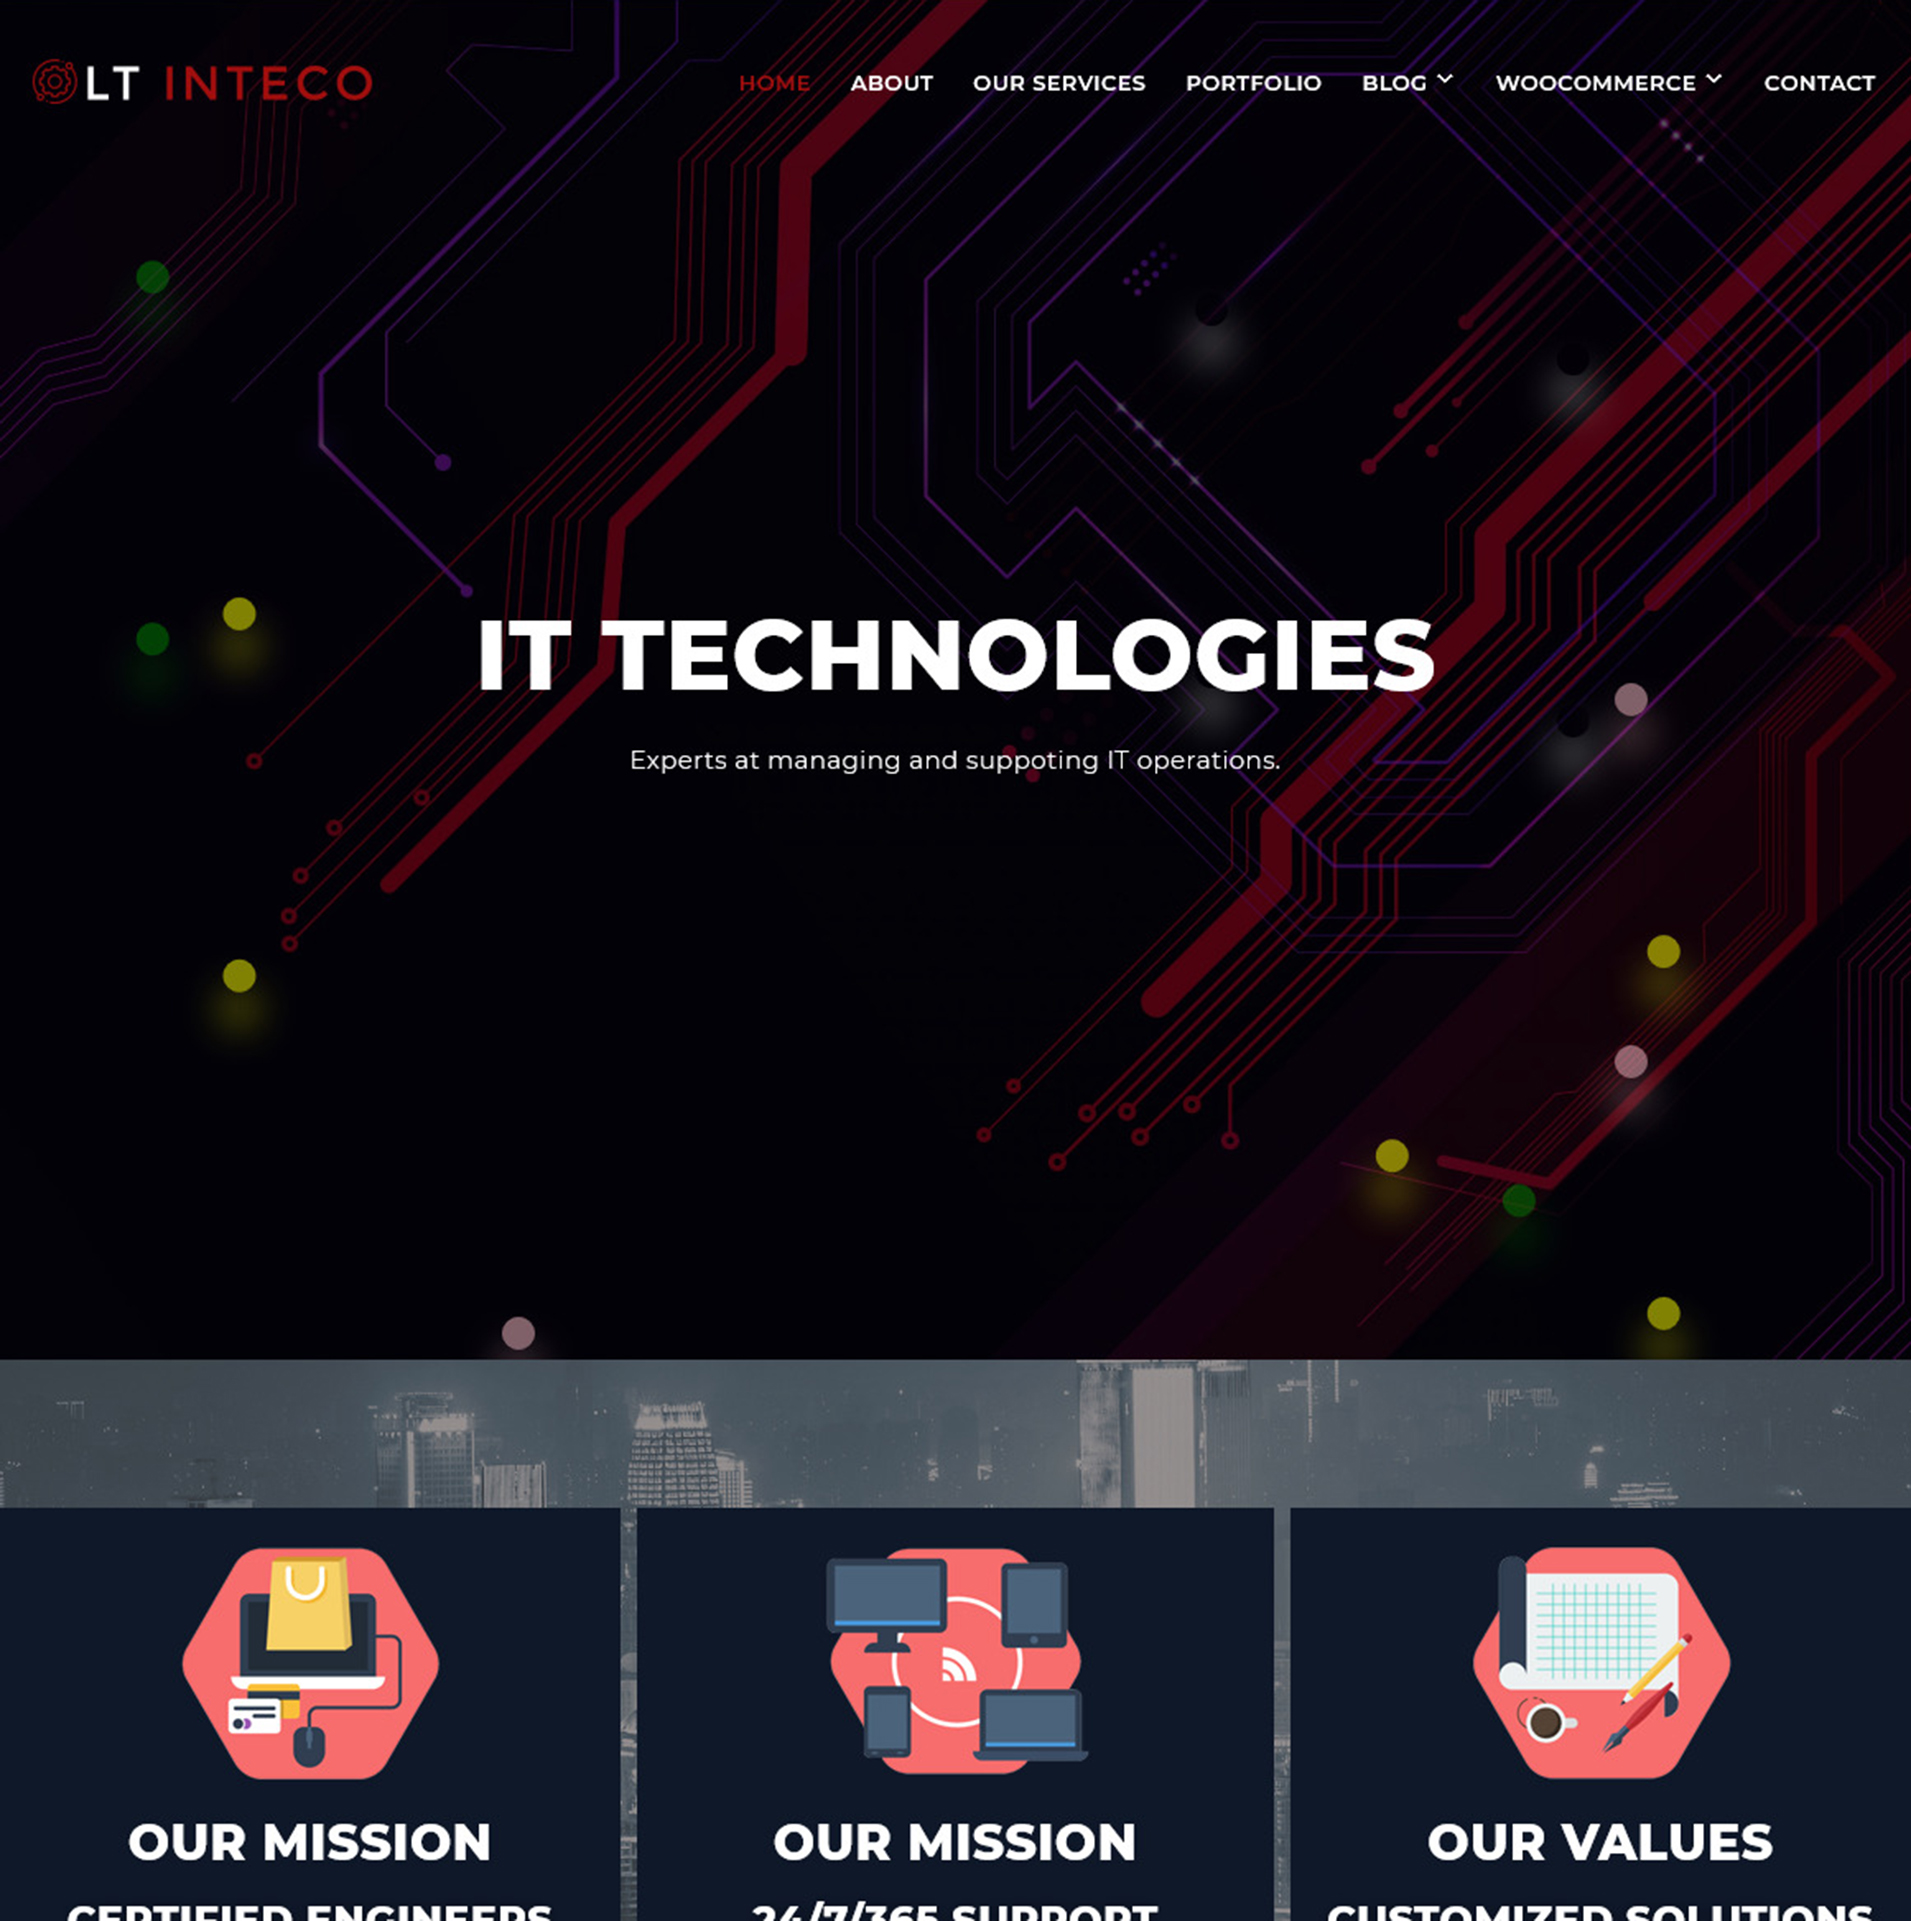 lt-inteco-free-wordpress-theme-screen